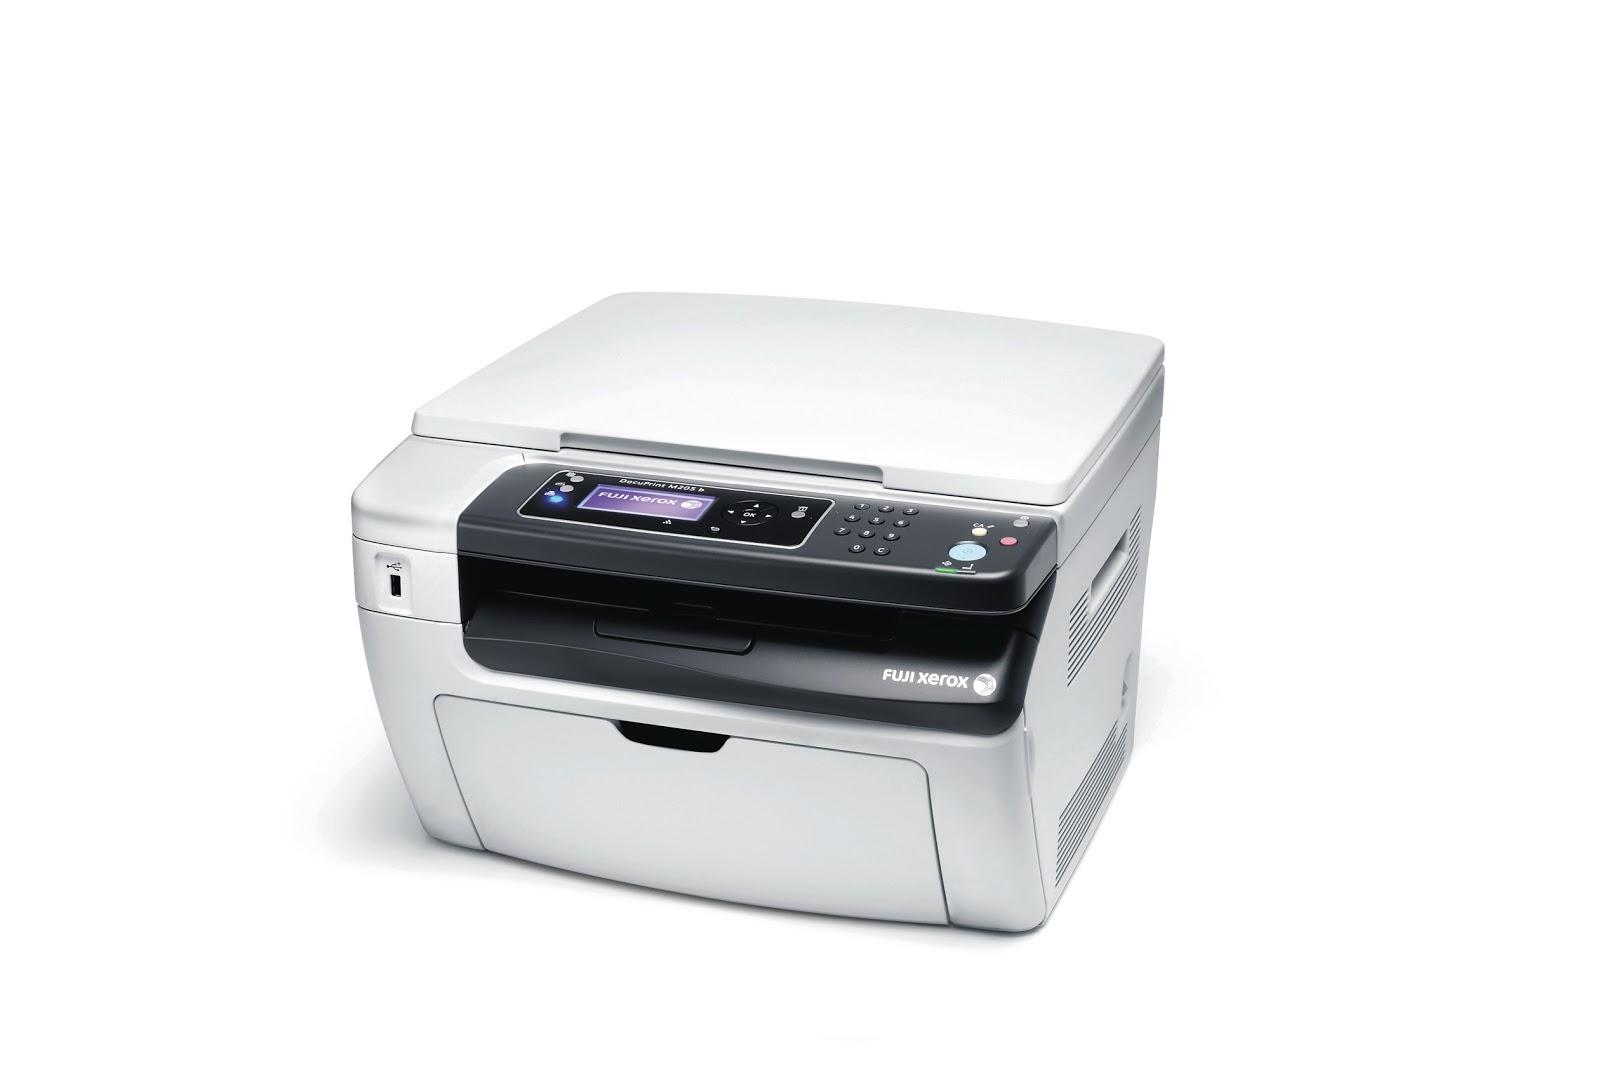 Printer Driver Download: Printer Fuji Xerox DocuPrint M205B Drivers